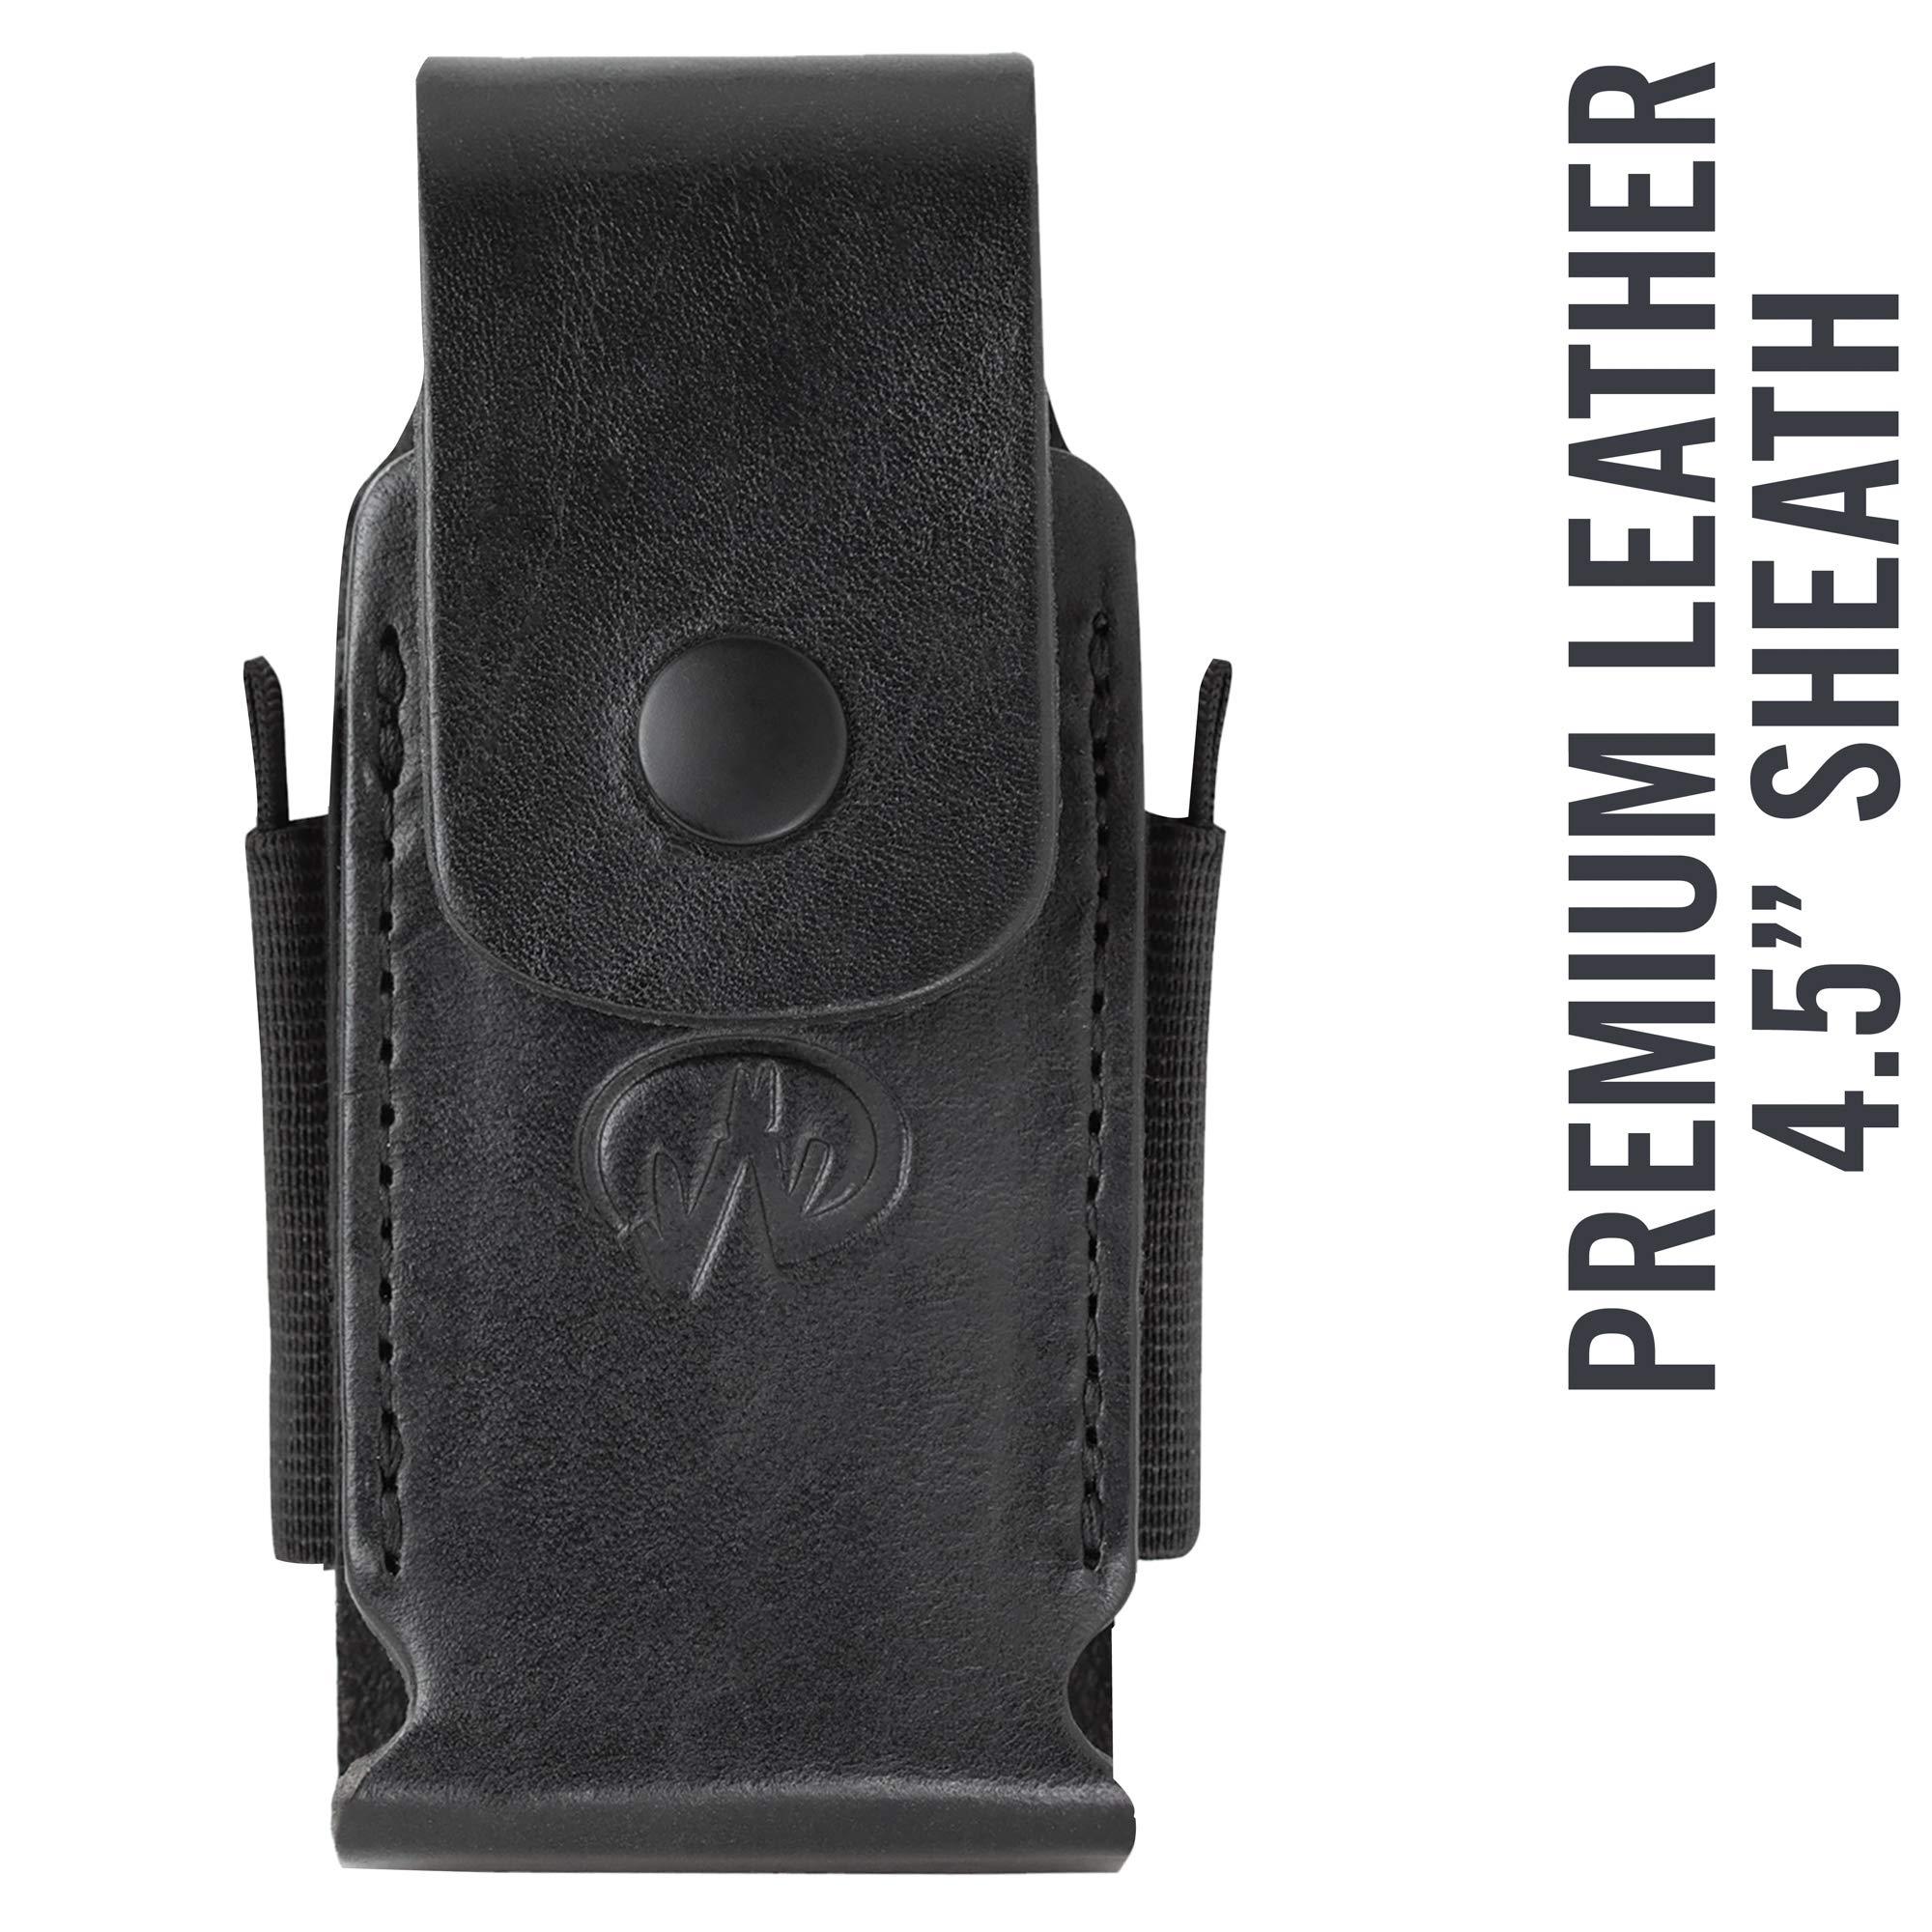 Catálogo de fundas leatherman para ti